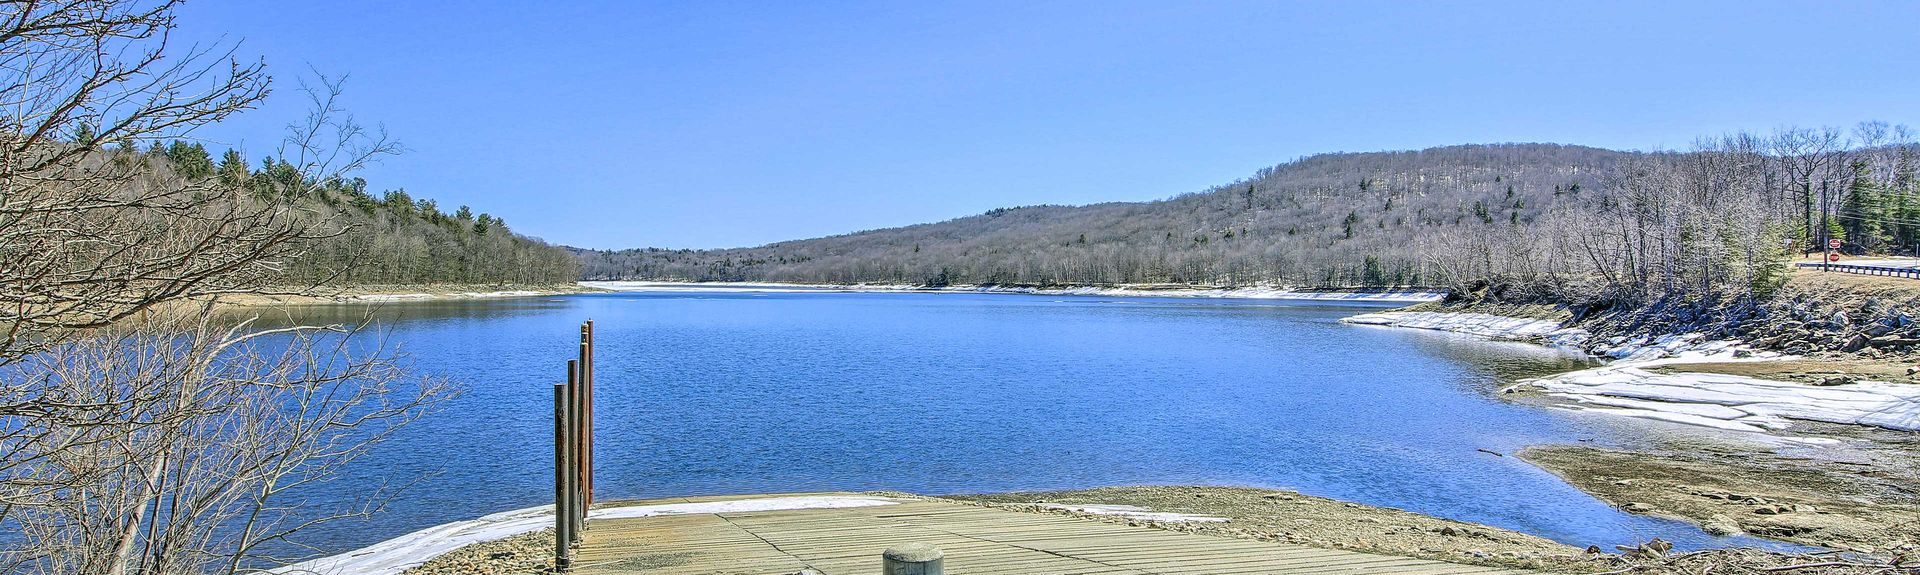 Woodford, Bennington, Vermont, Stany Zjednoczone